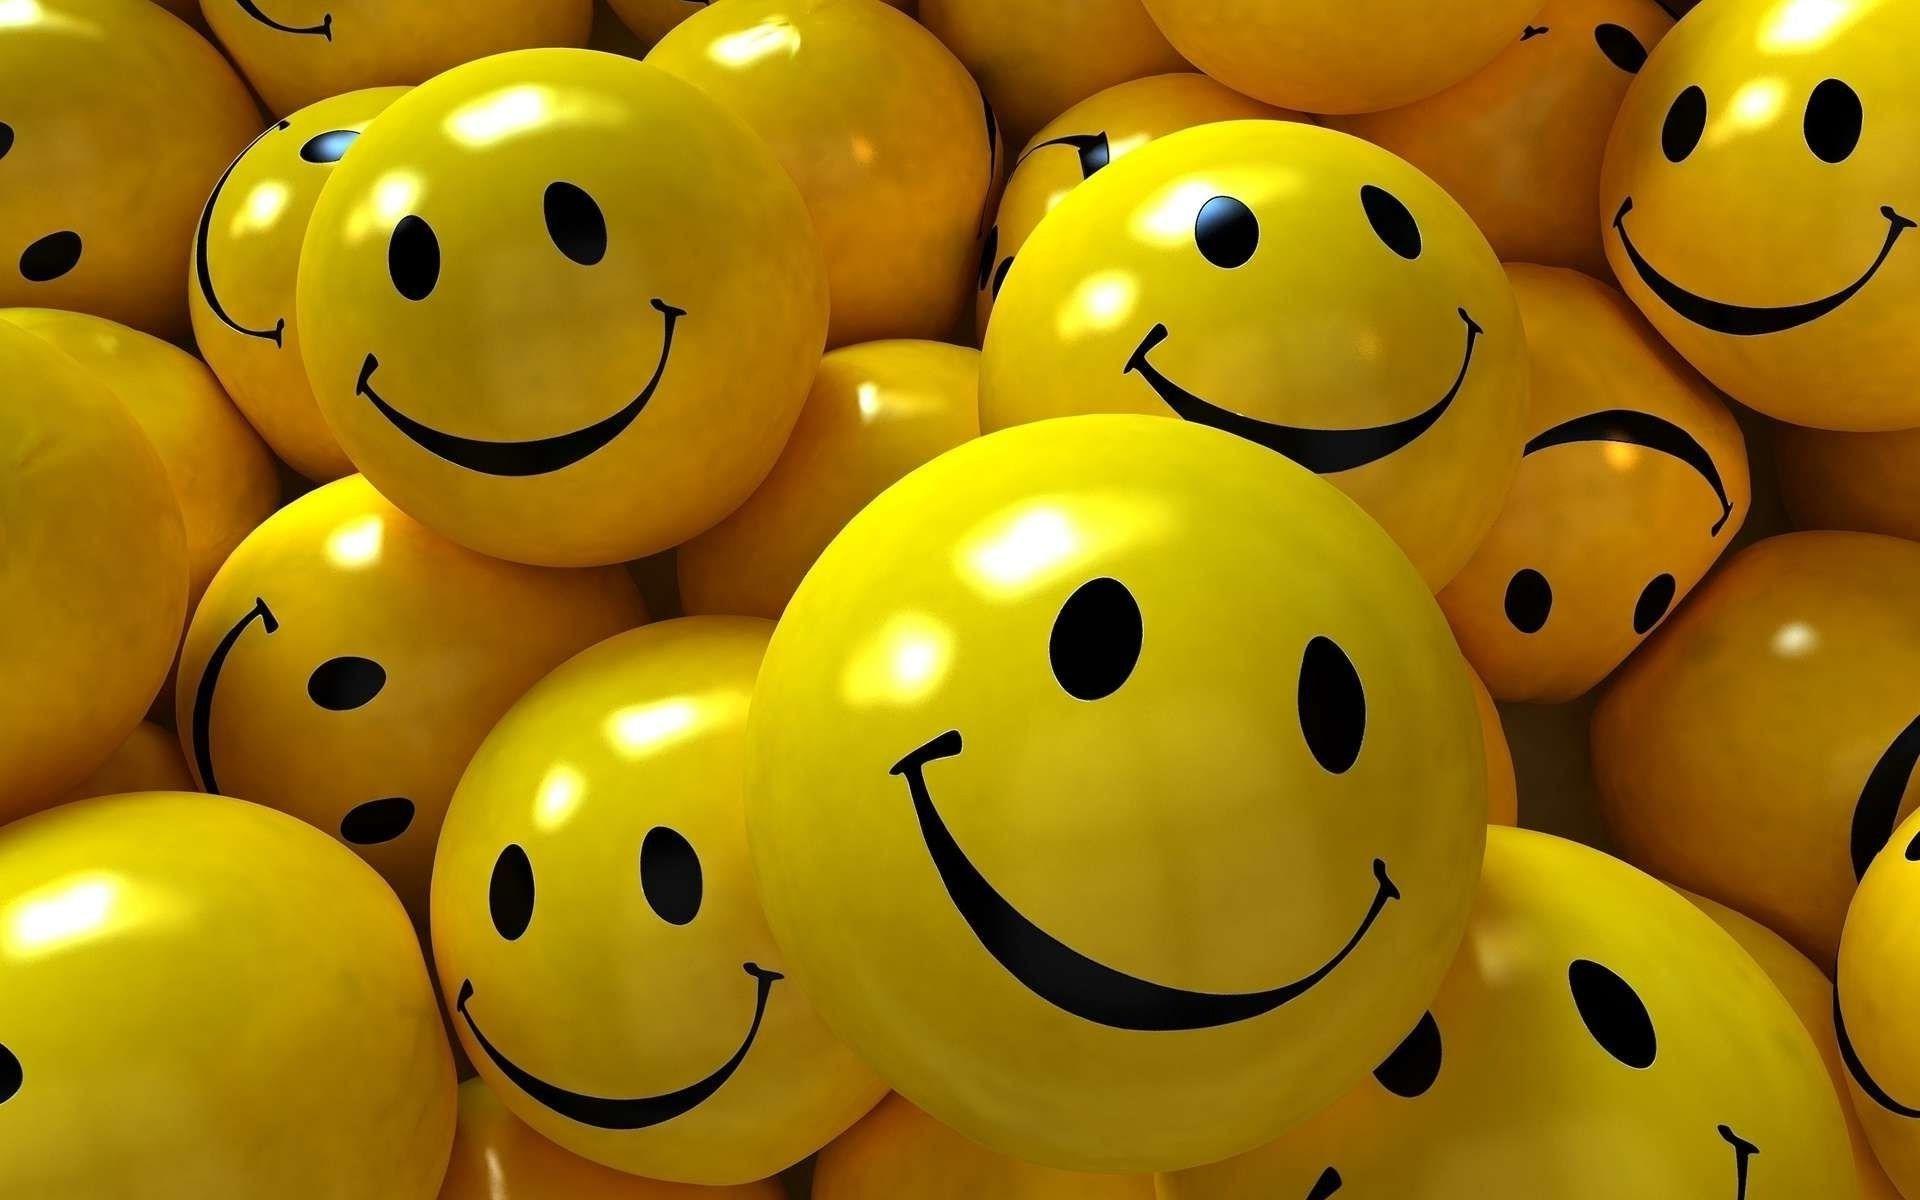 Hd Emoji Wallpapers 70 Images